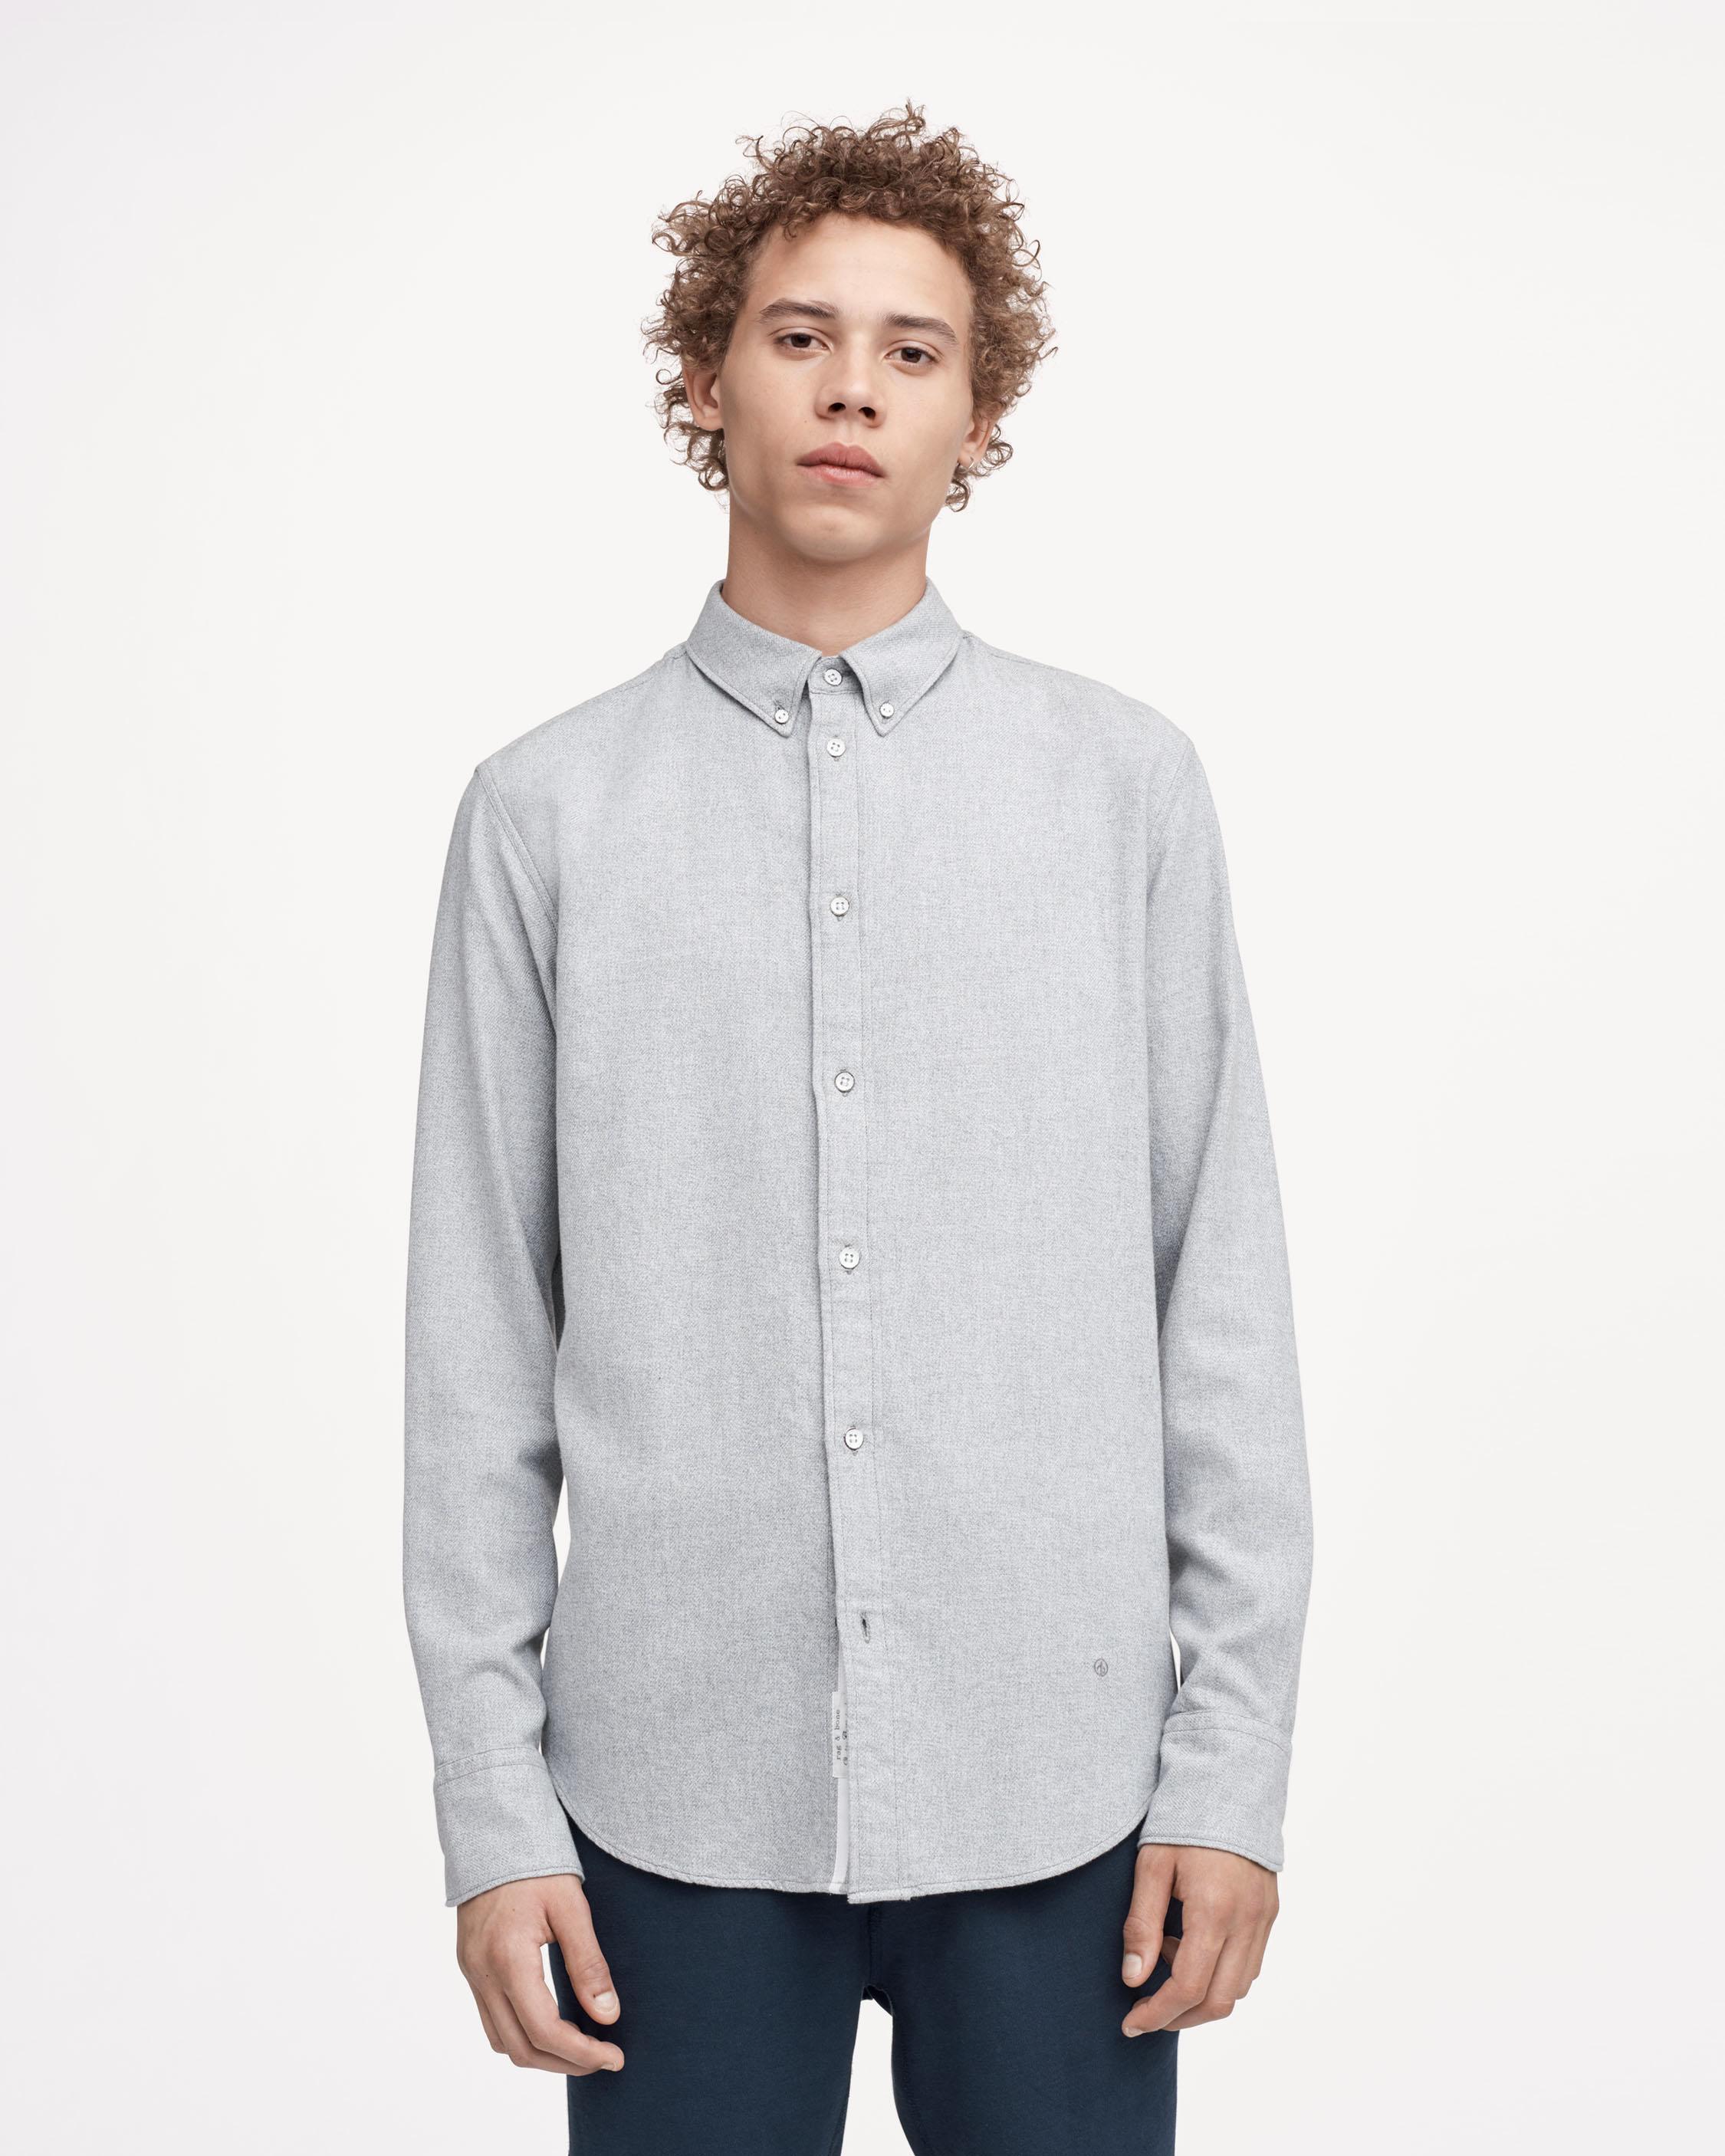 Rag bone fit 2 tomlin shirt in grey for men lyst for Rag and bone mens shirts sale